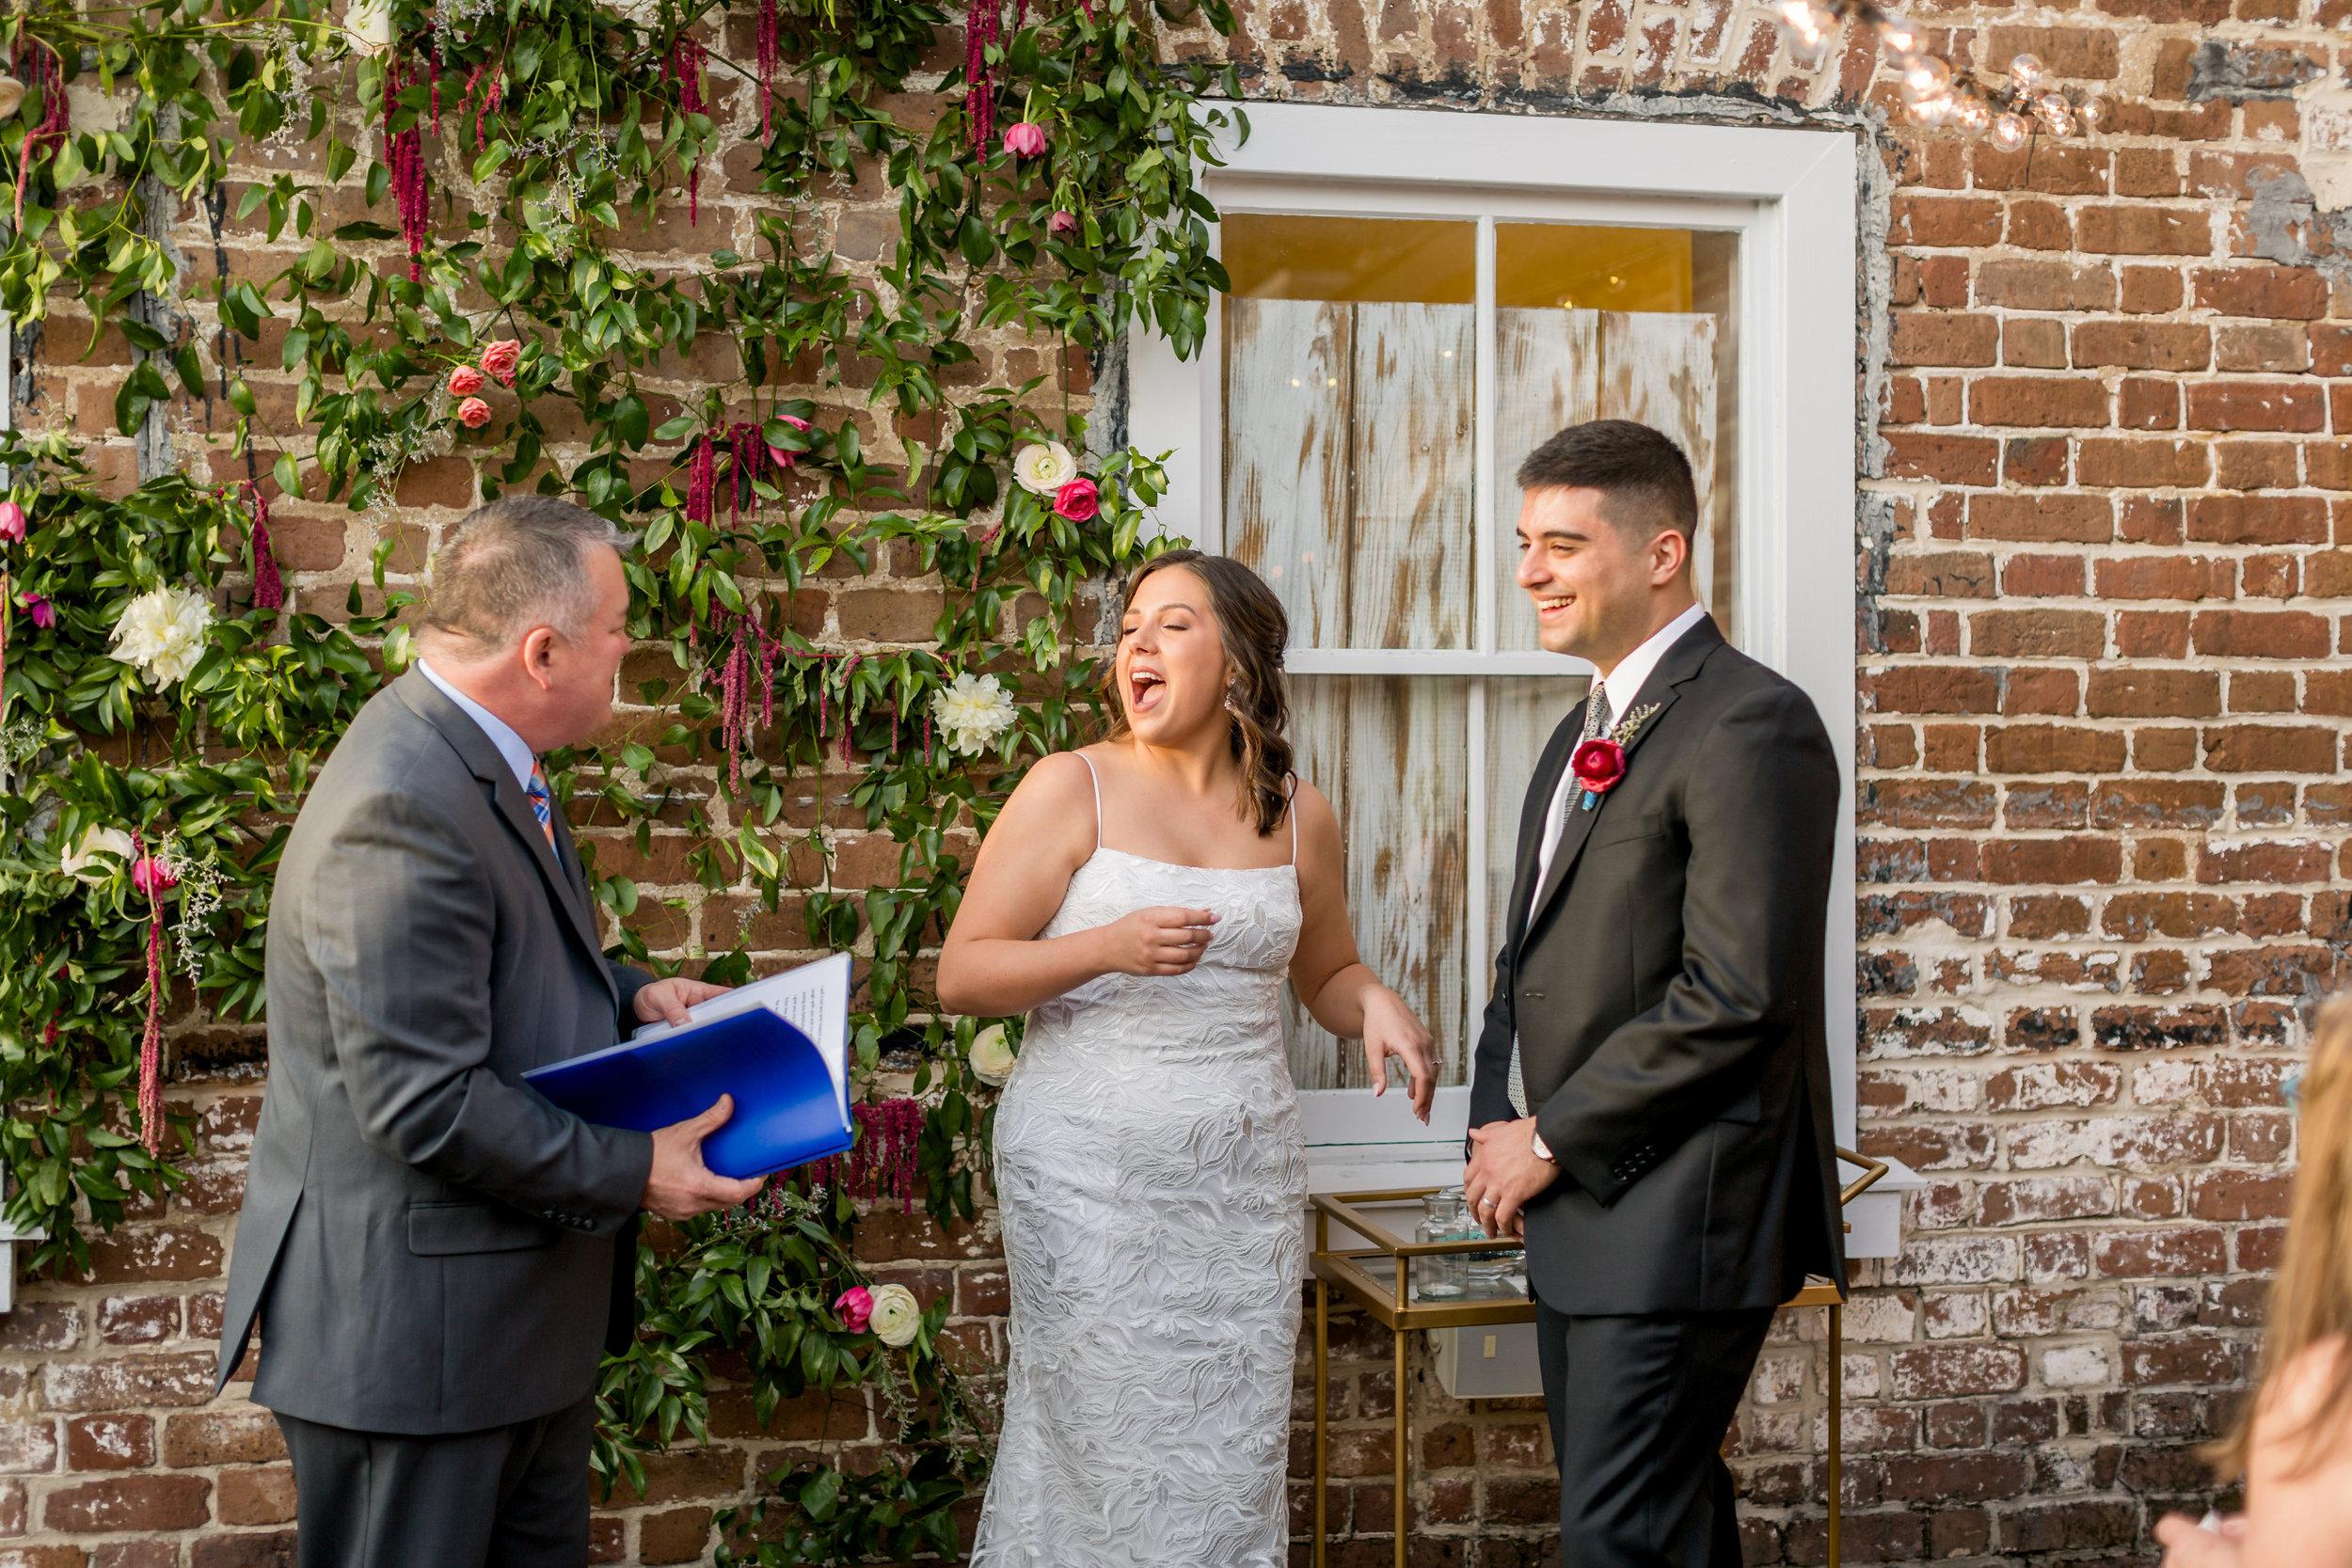 charleston new years elopement popup surprise wedding at upstairs at midtown - scarlet plan & design wedding planners (72).jpg